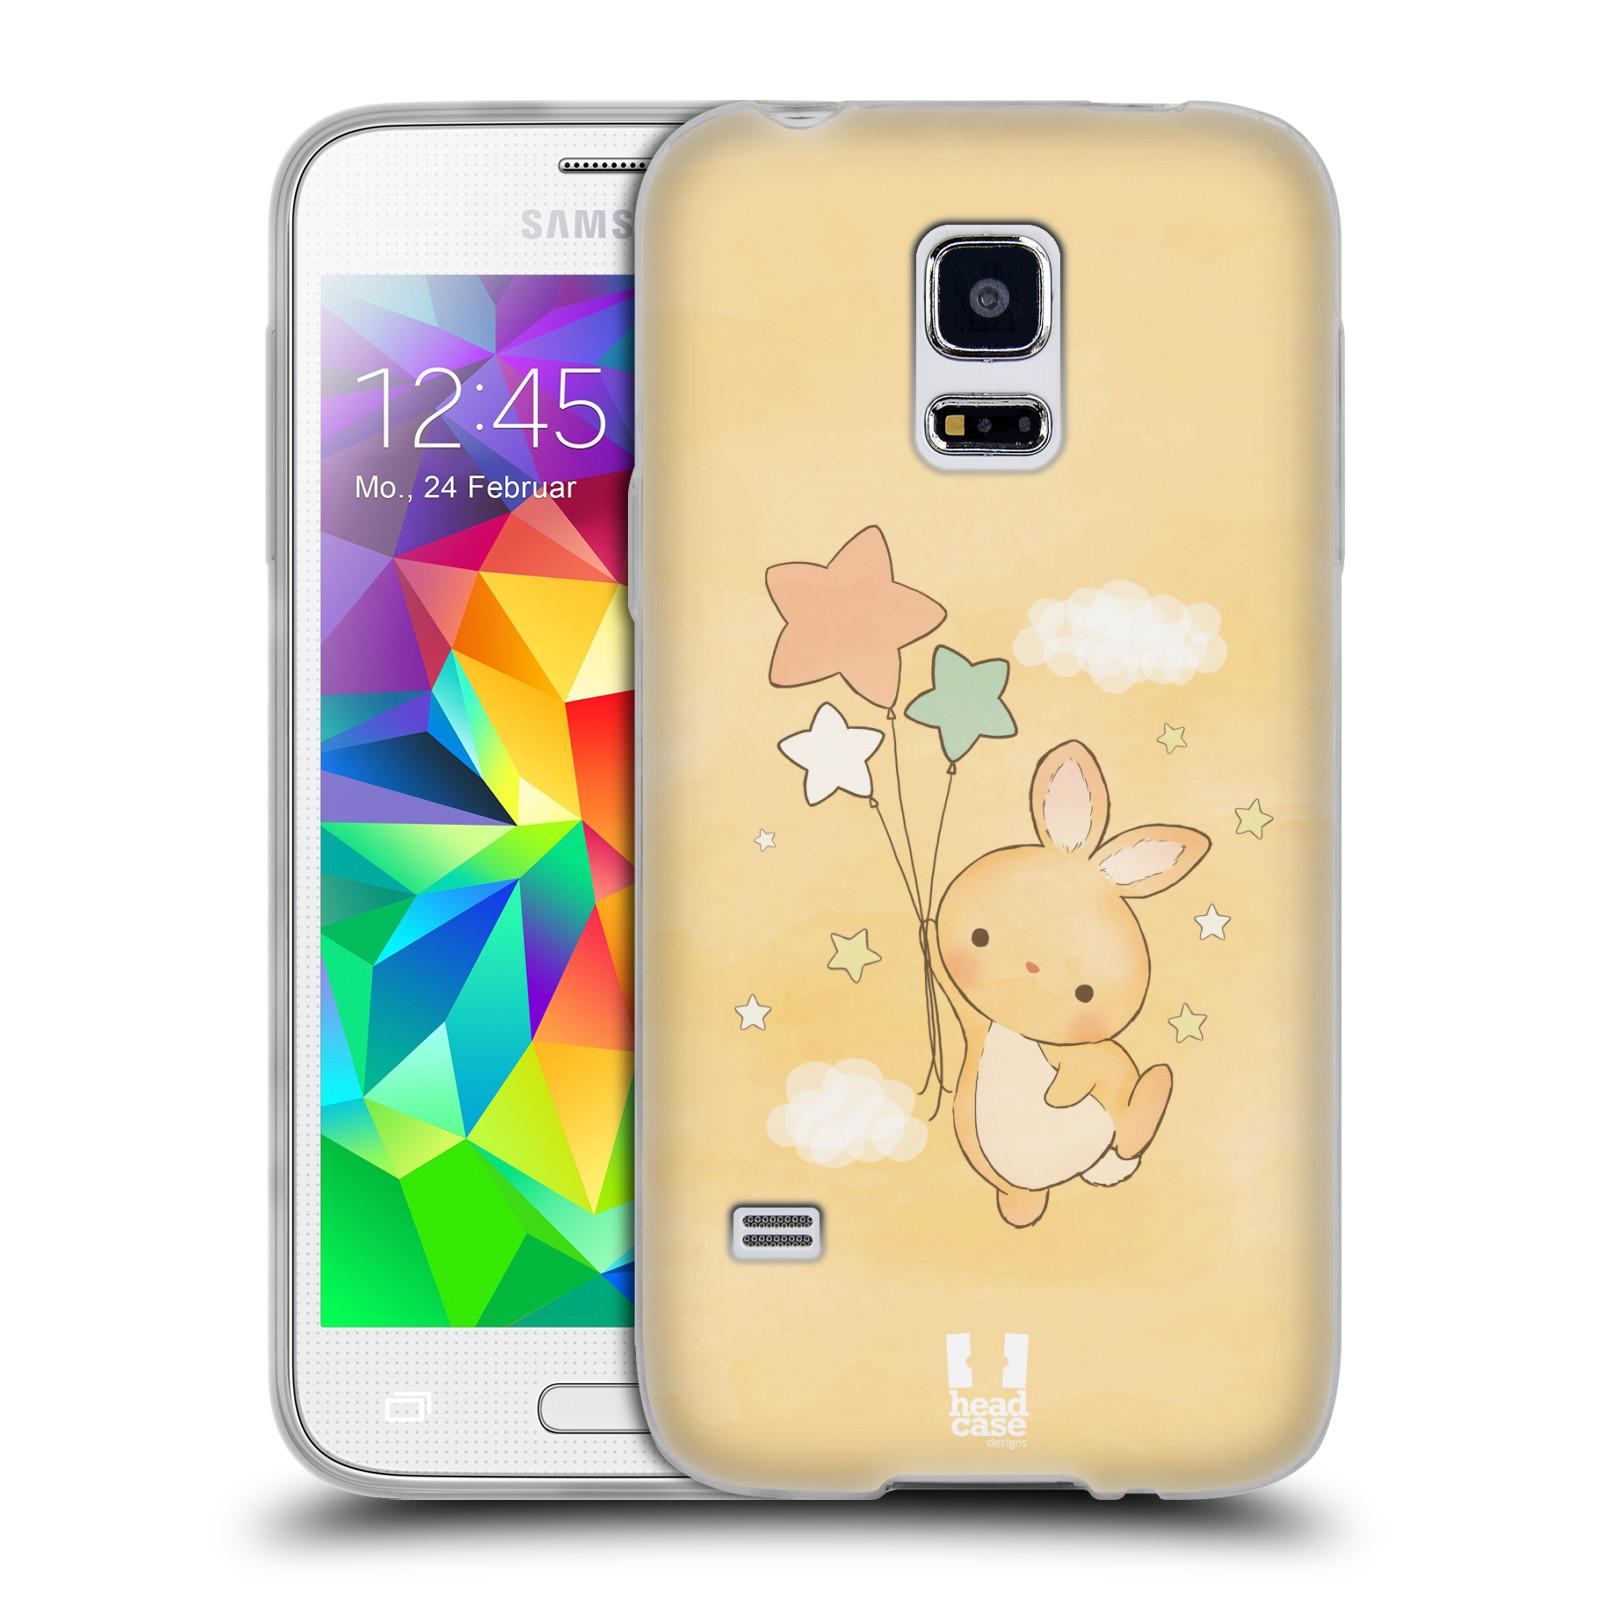 HEAD CASE silikonový obal na mobil Samsung Galaxy S5 MINI vzor králíček a hvězdy žlutá